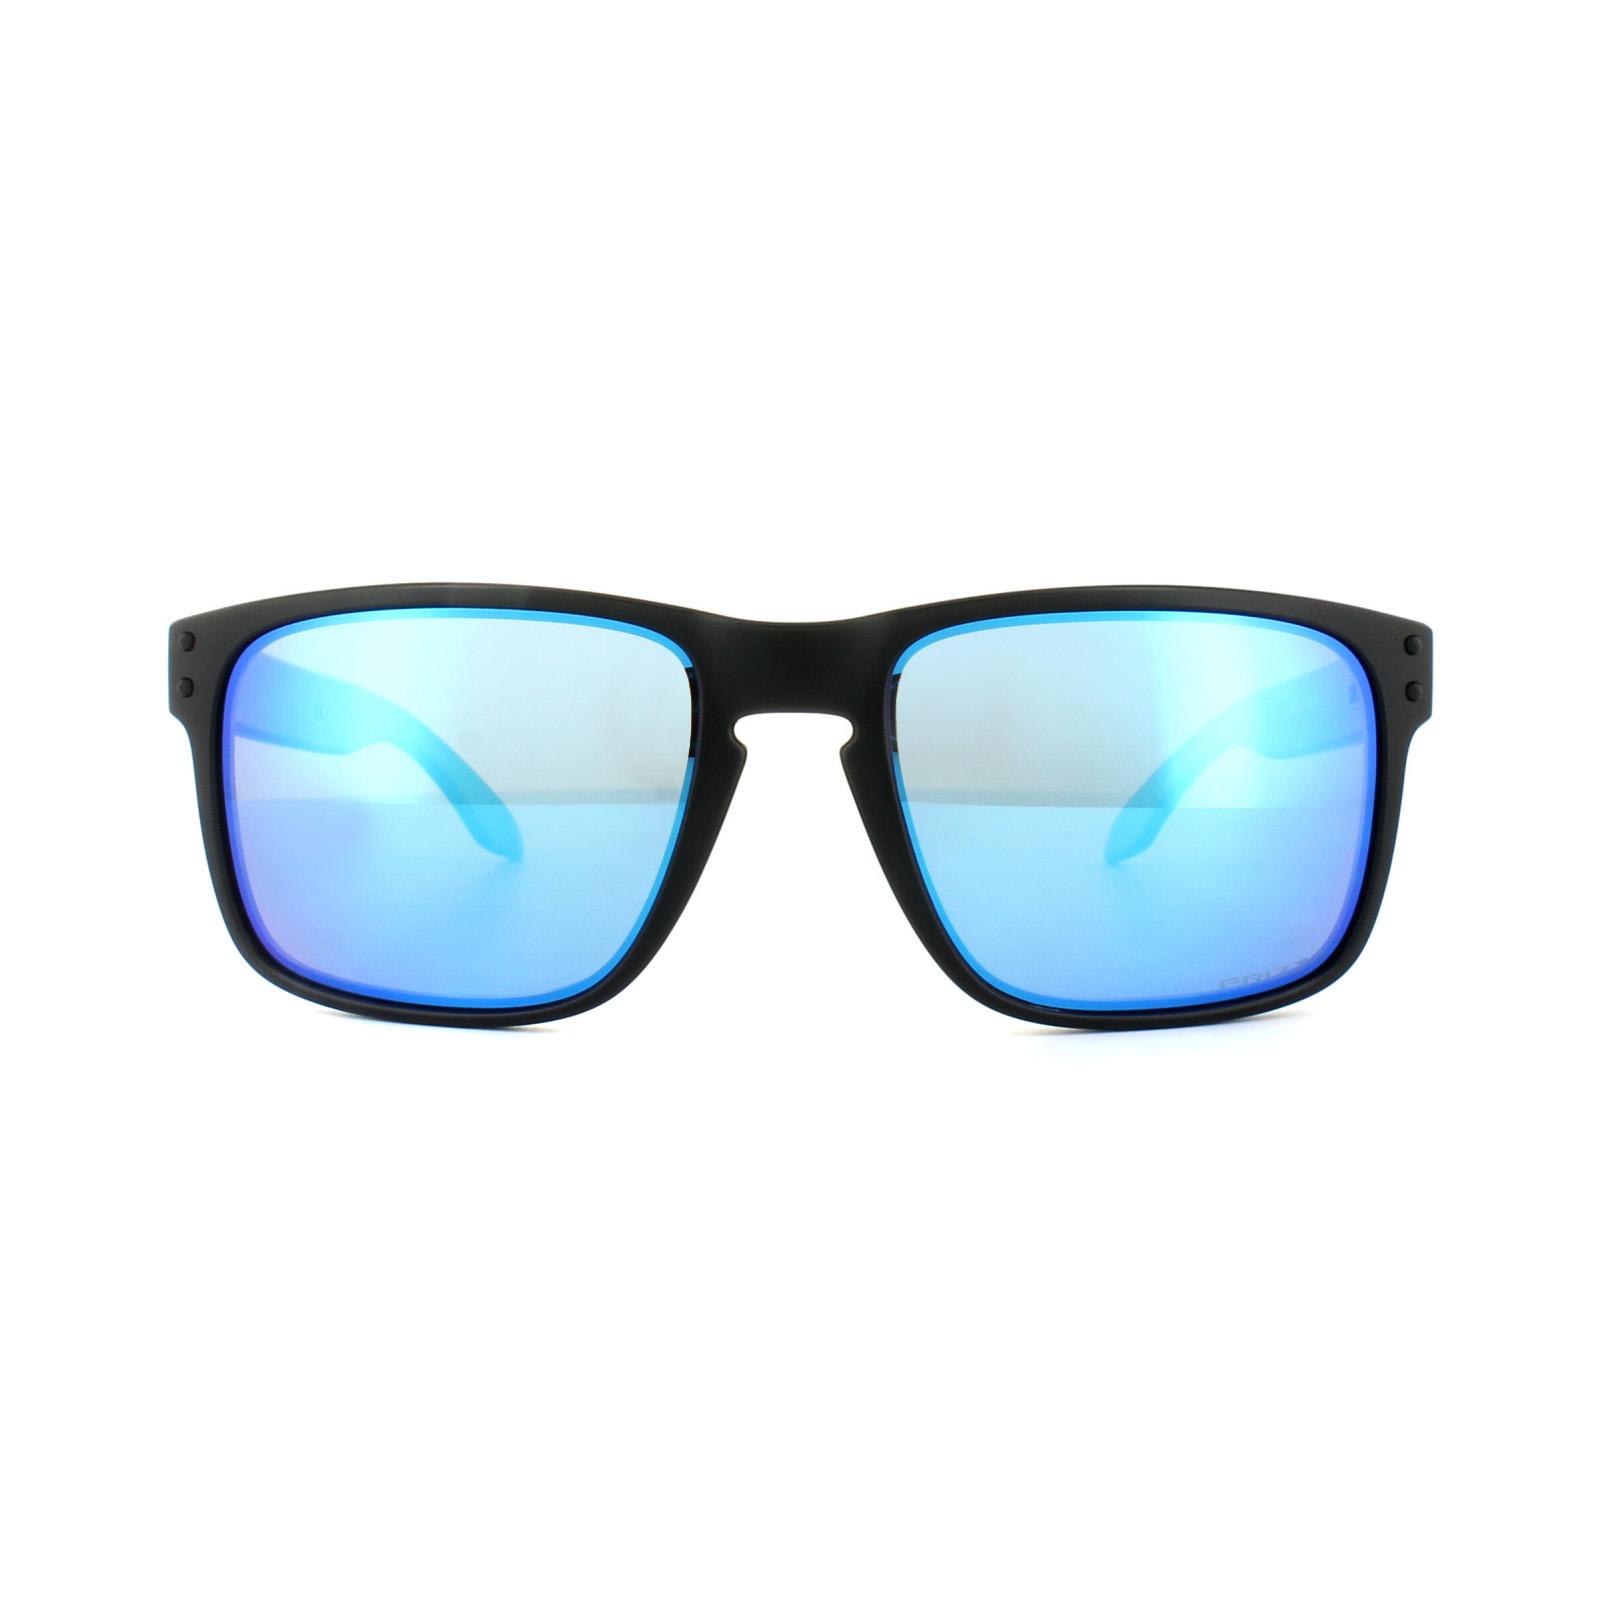 8d81b4dbc3b Oakley Sunglasses Holbrook Ebay